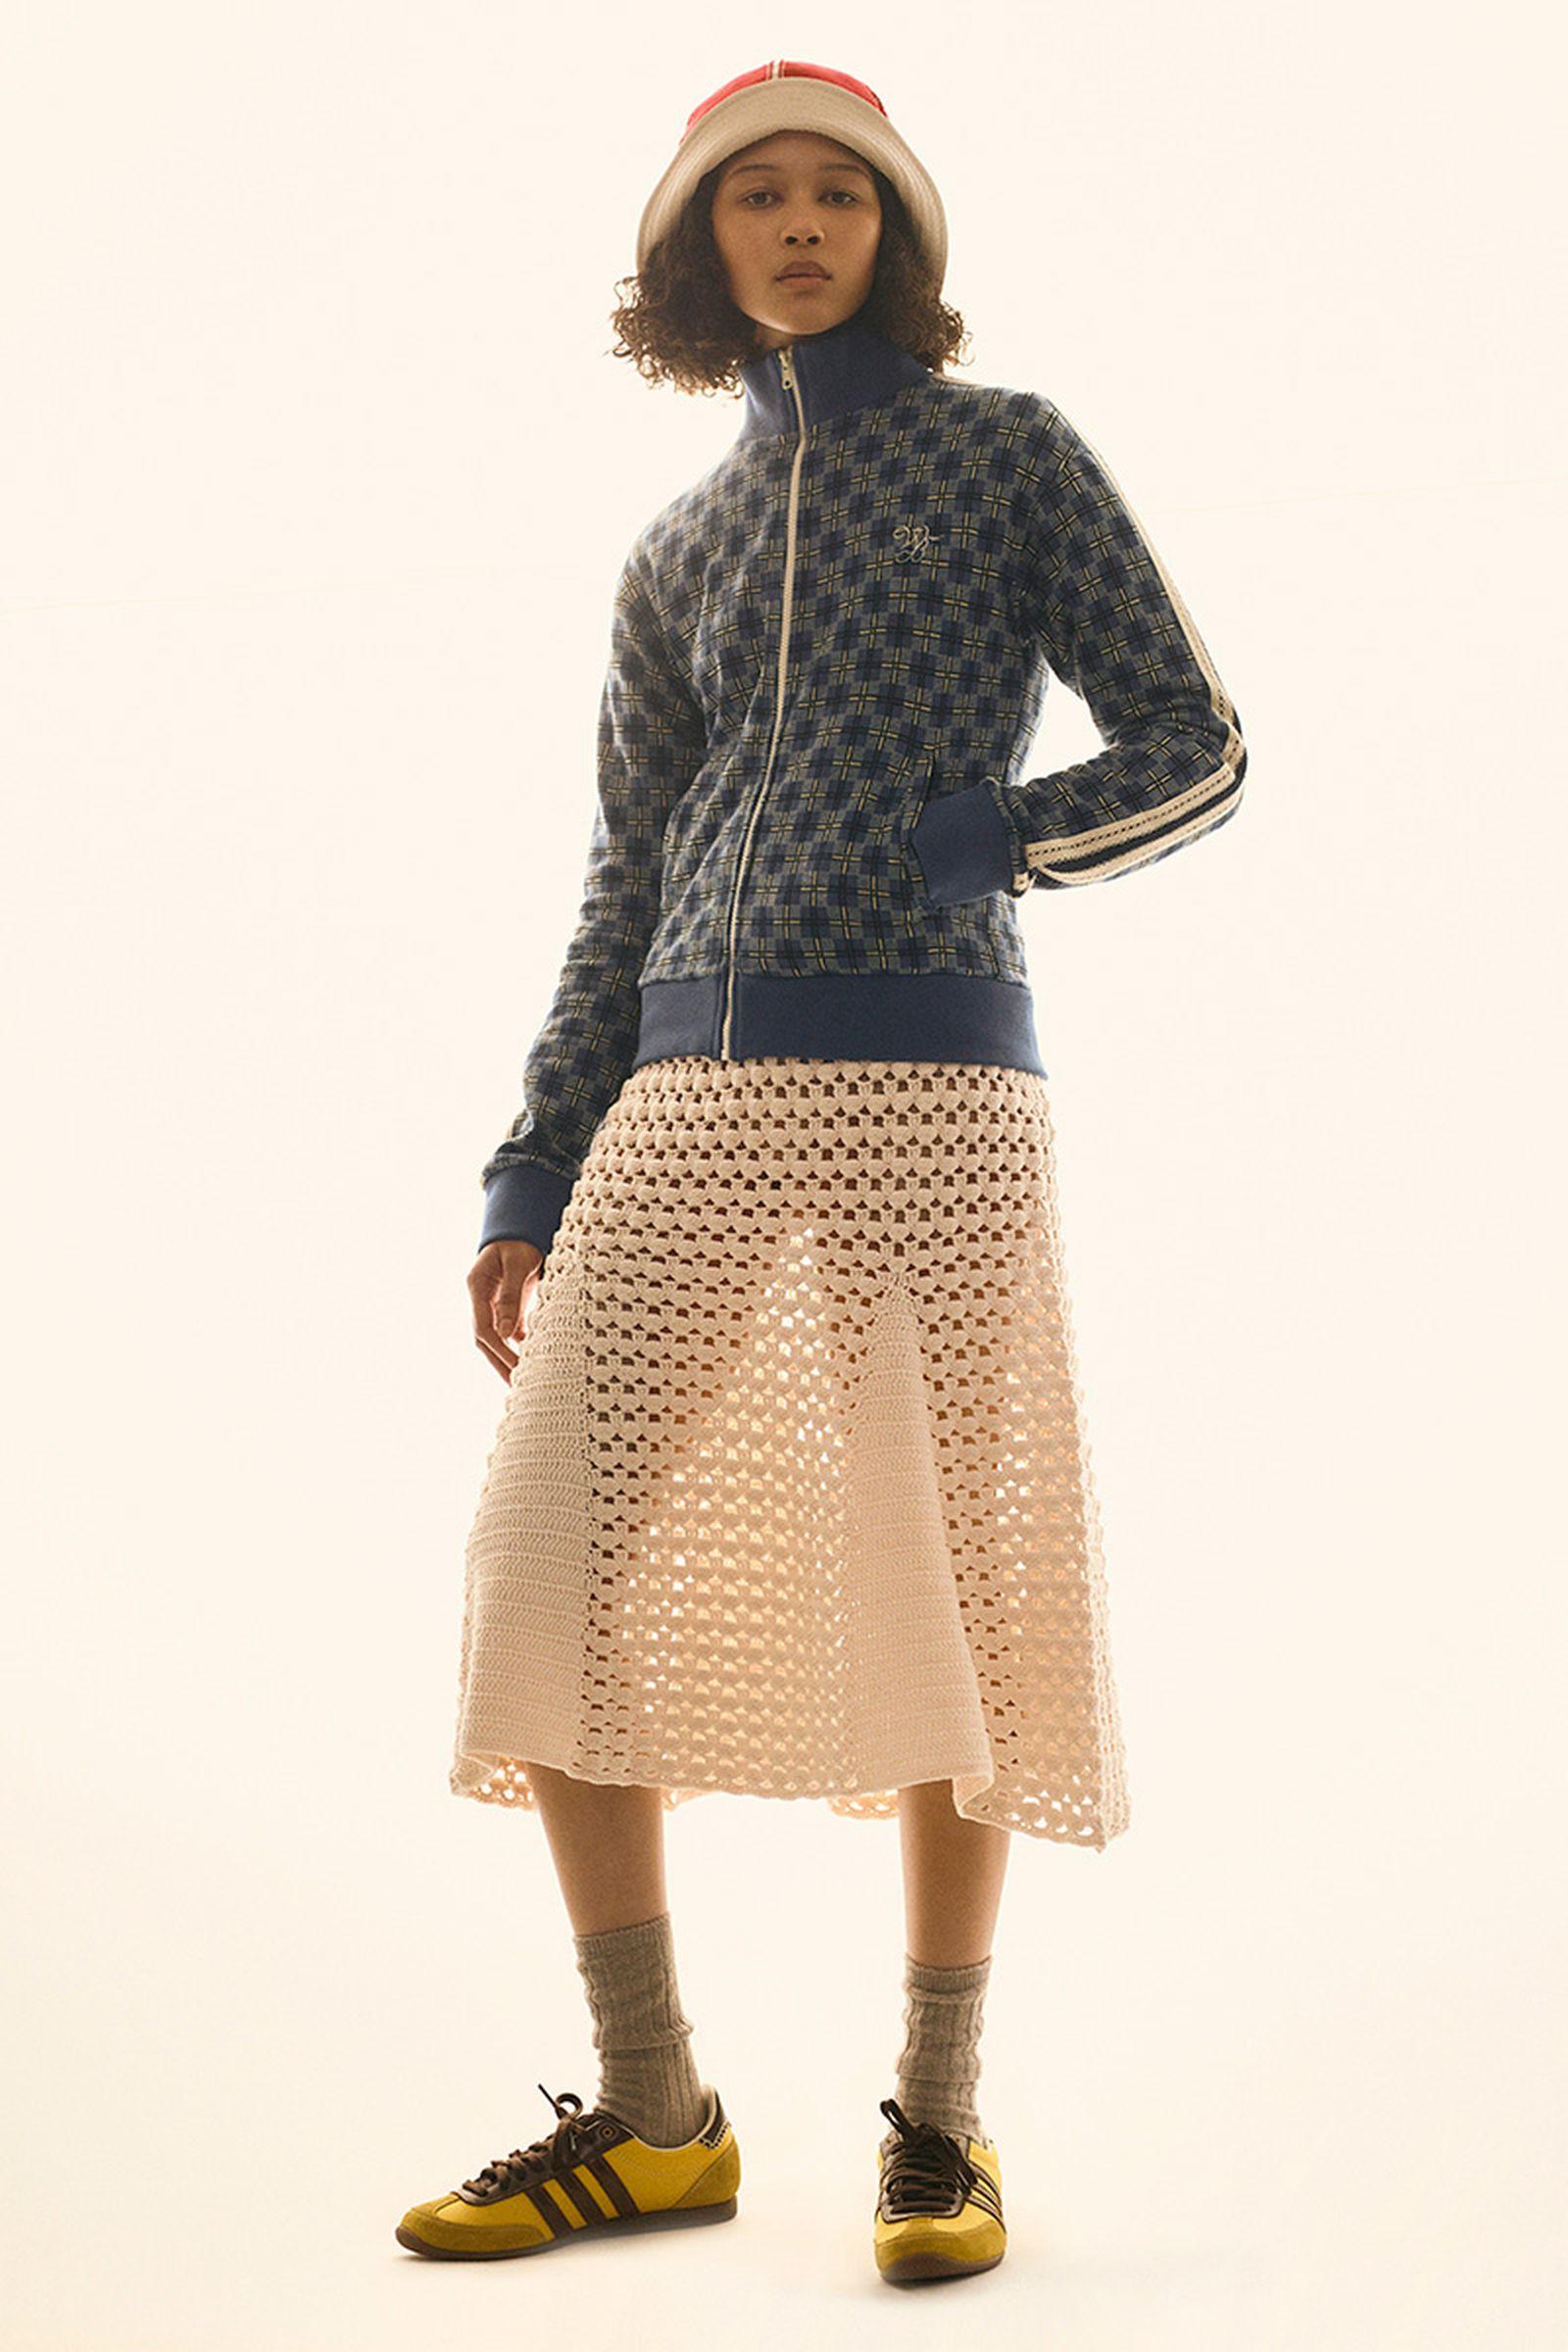 fashion-week-fw21-sneaker-roundup-wales-bonner-02